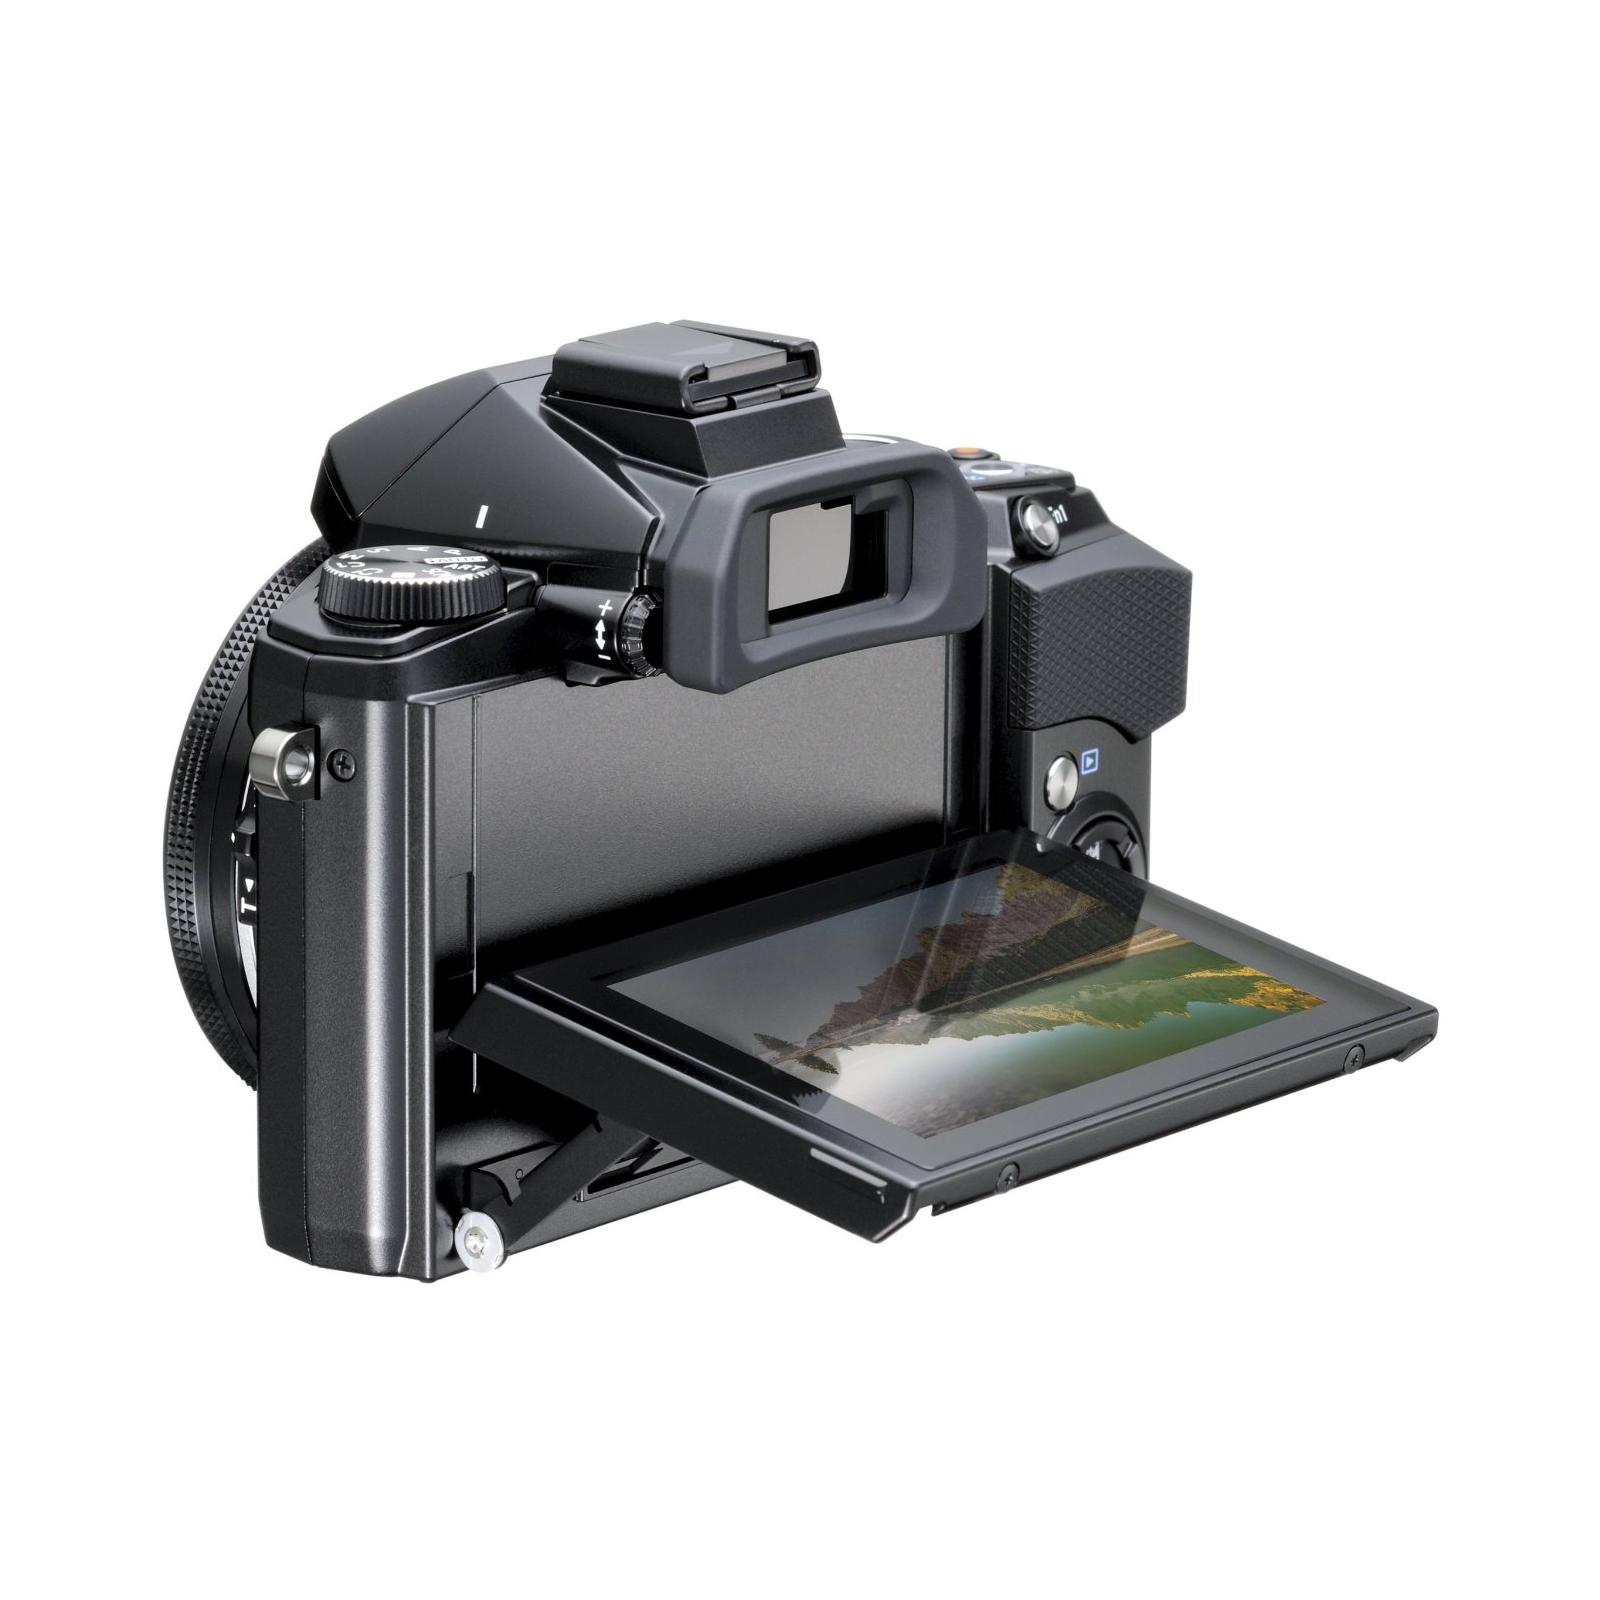 Цифровой фотоаппарат OLYMPUS STYLUS 1 Black (V109010BE000) изображение 4